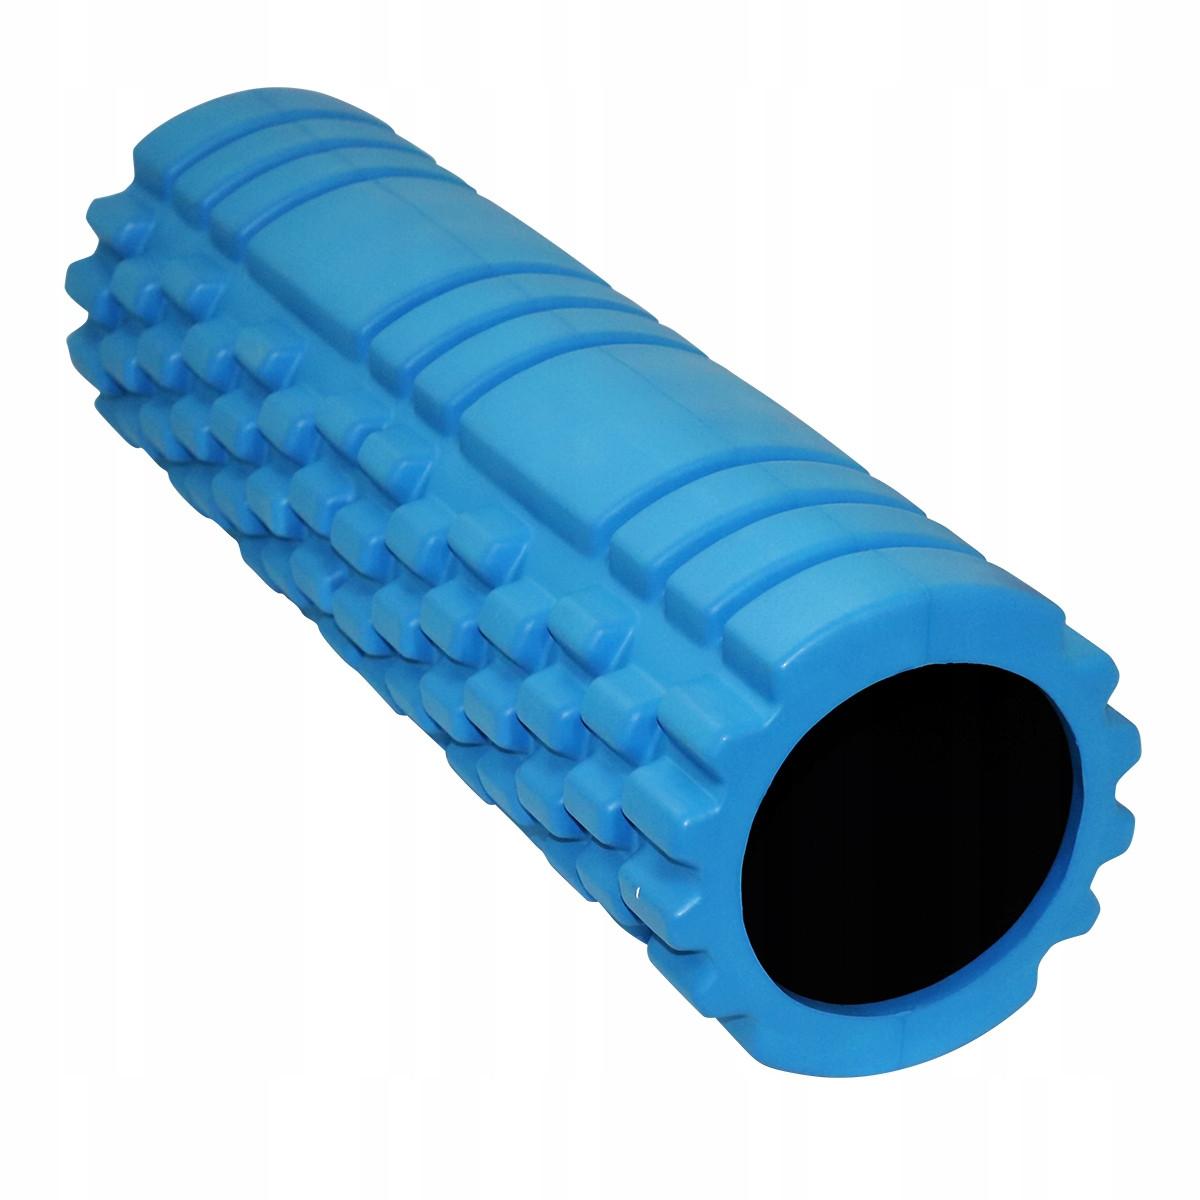 Масажний ролик (валик, роллер) SportVida EVA 45 x 14 см SV-HK0213 Blue